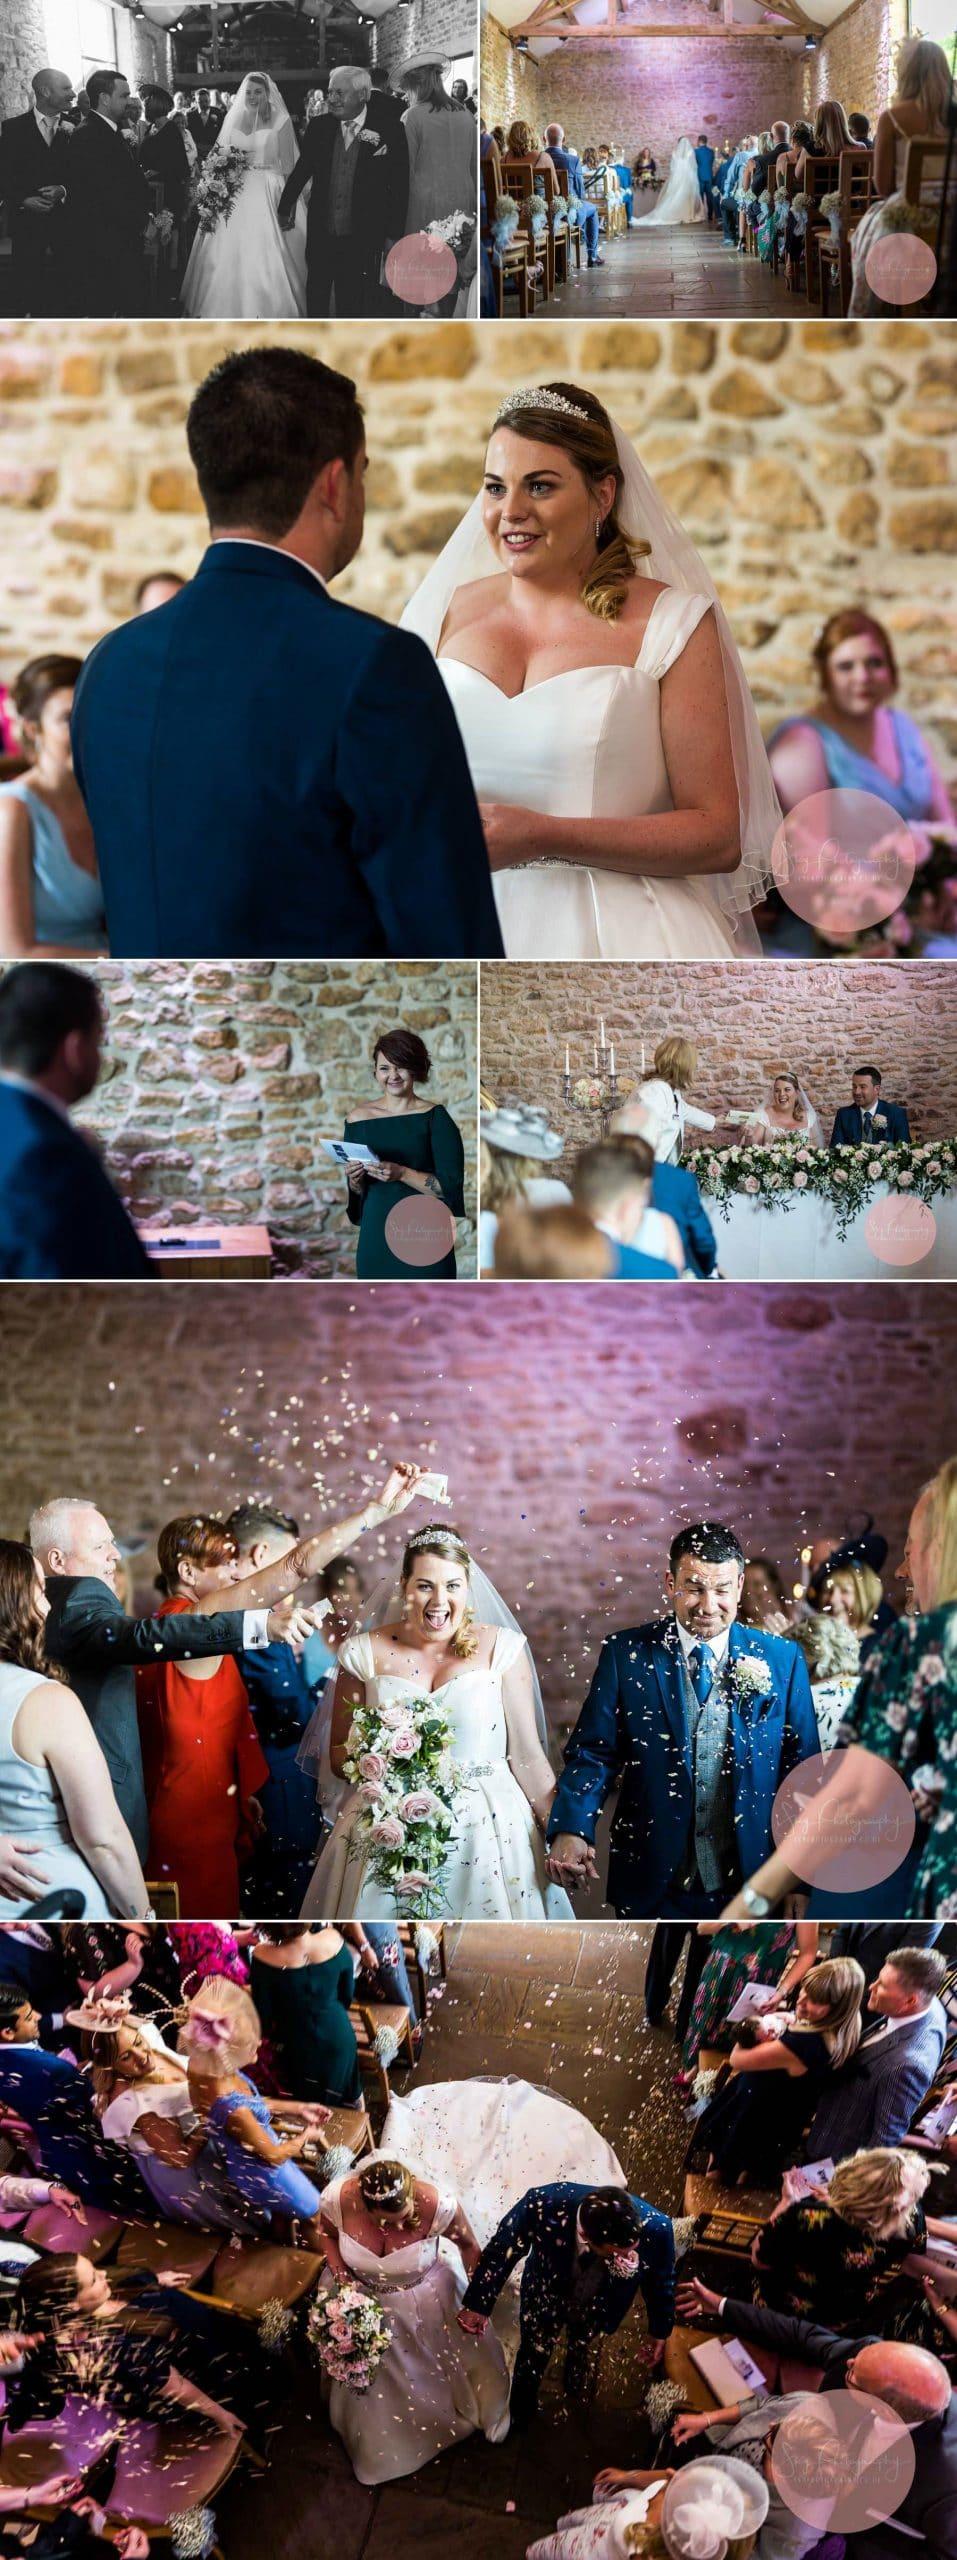 Dodford Manor Ceremony and Confetti Collage